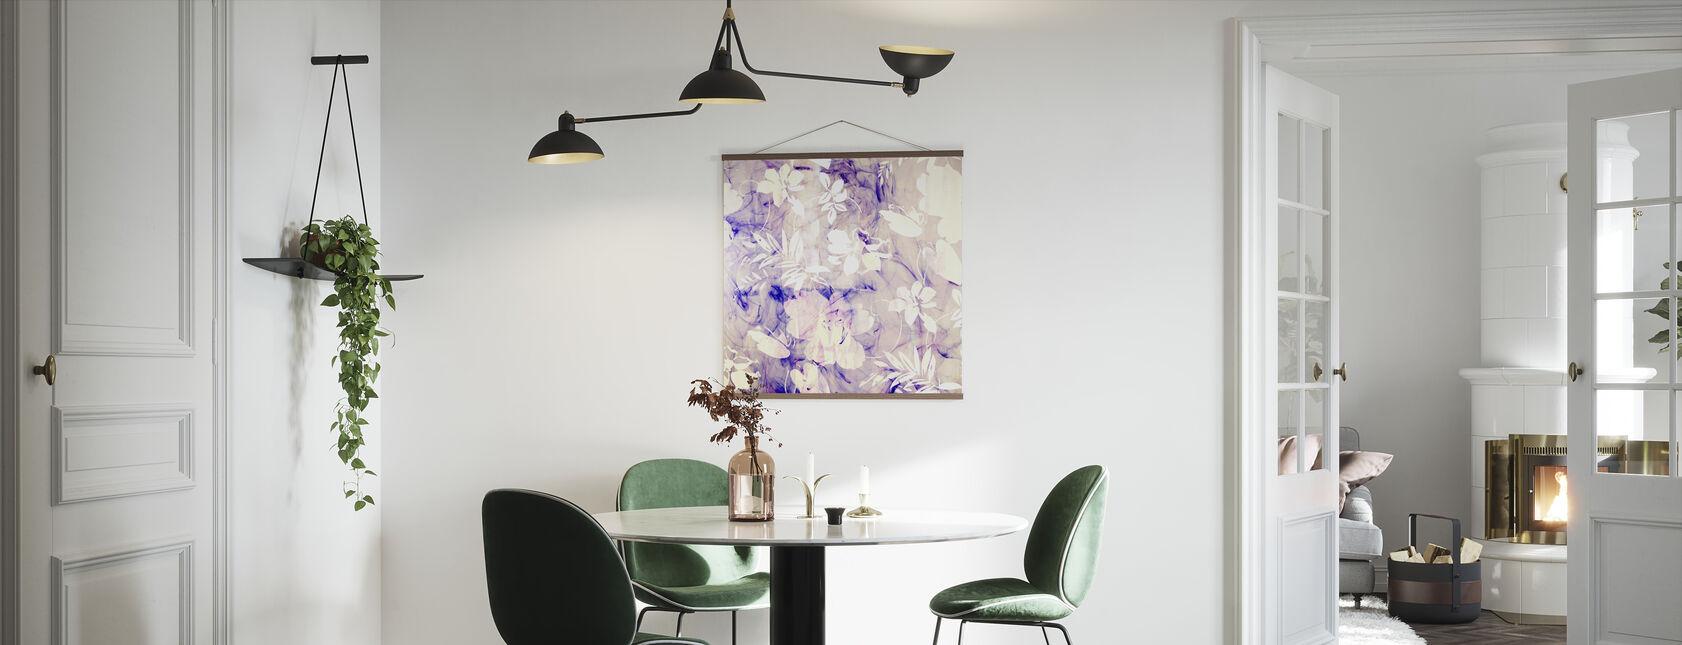 Turquoise Madam - Poster - Kitchen